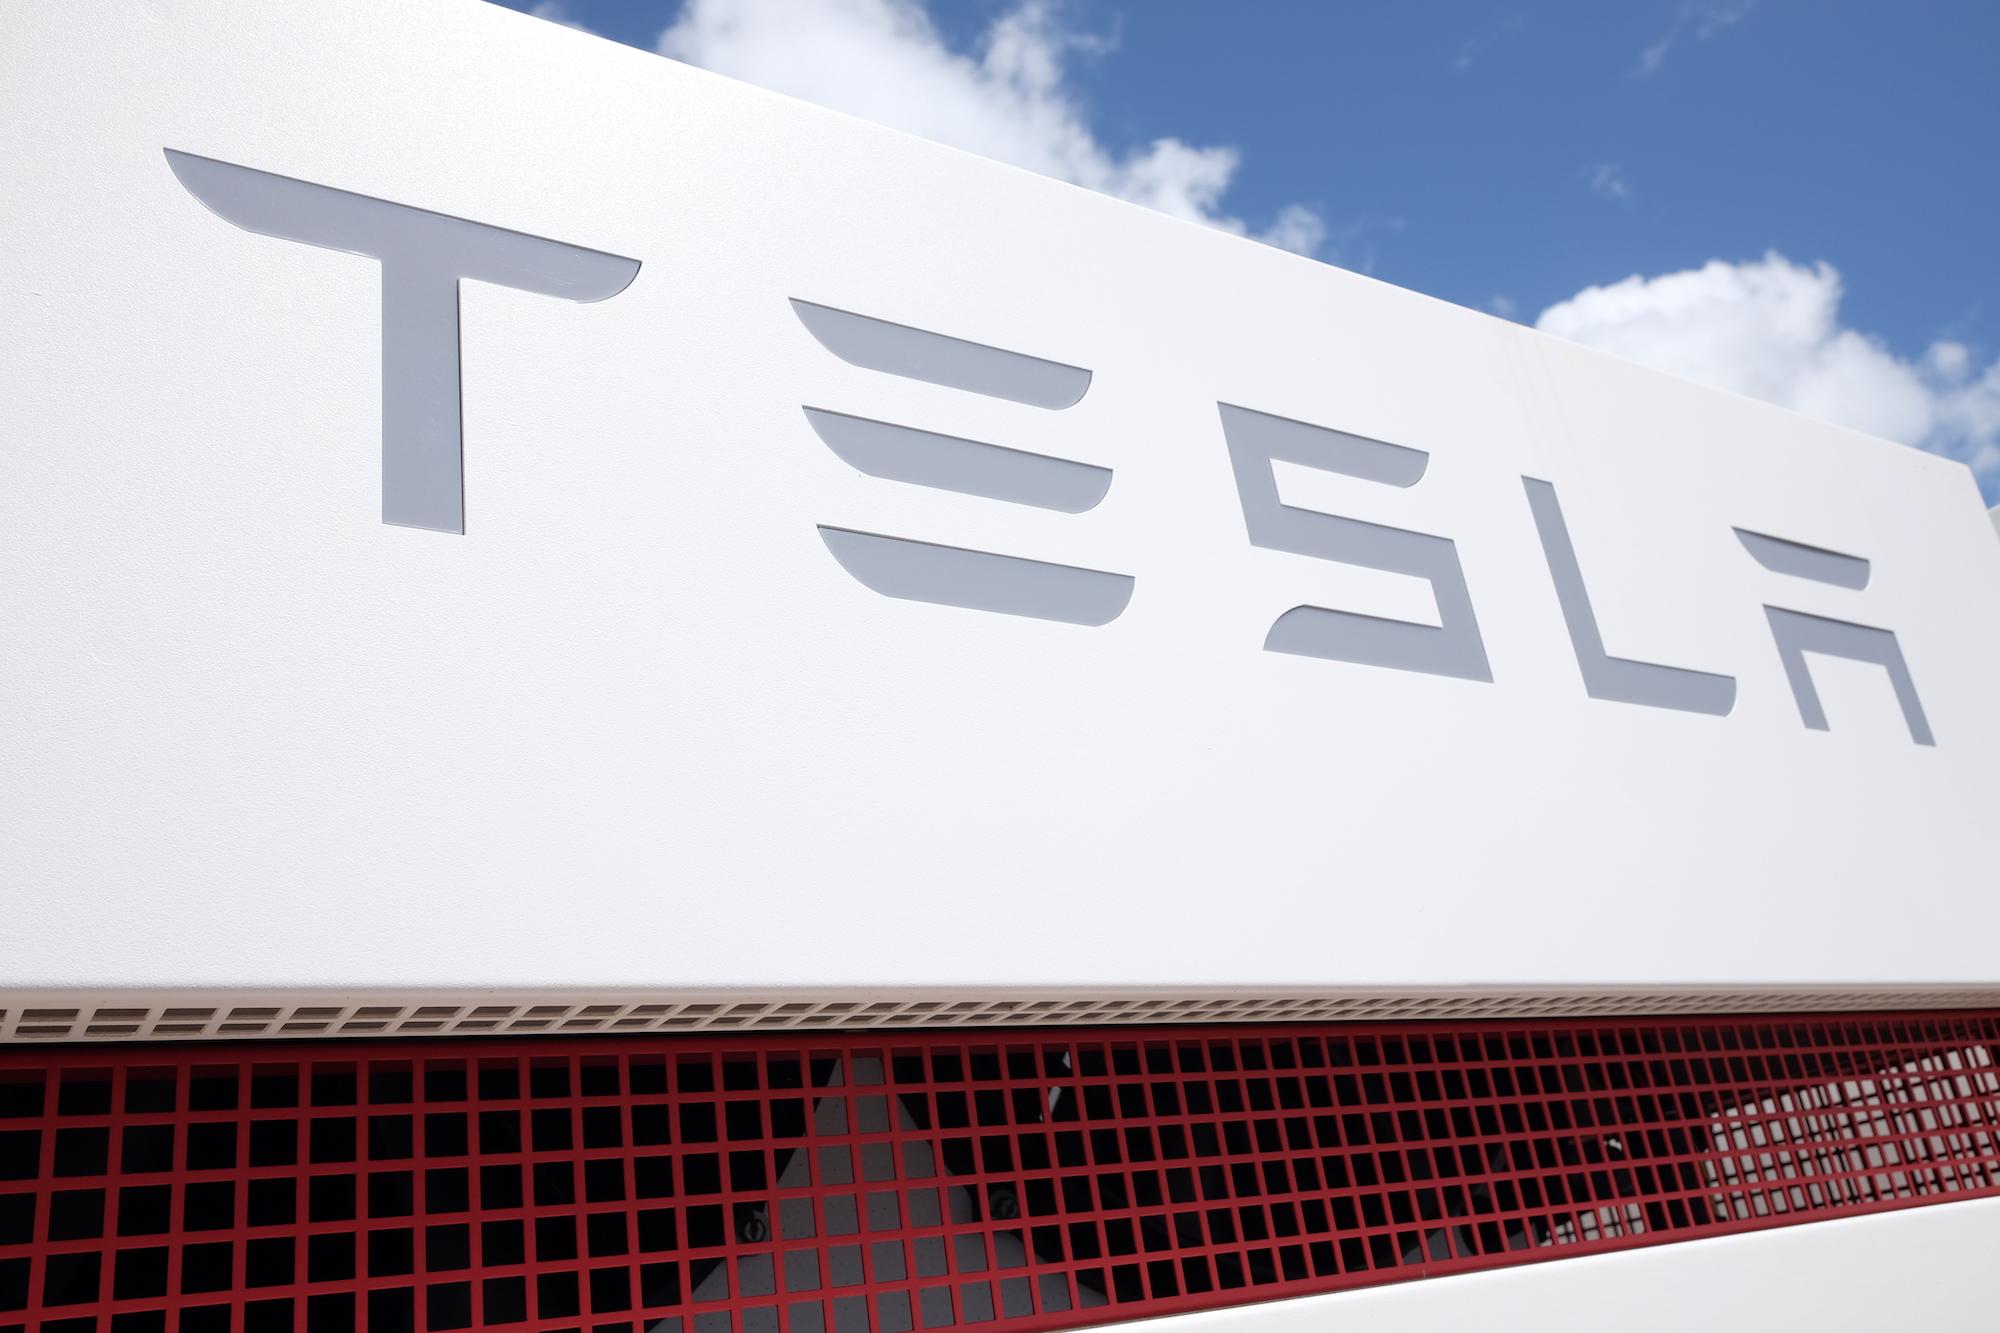 Tesla looks to take solar mainstream with Home Depot partnership